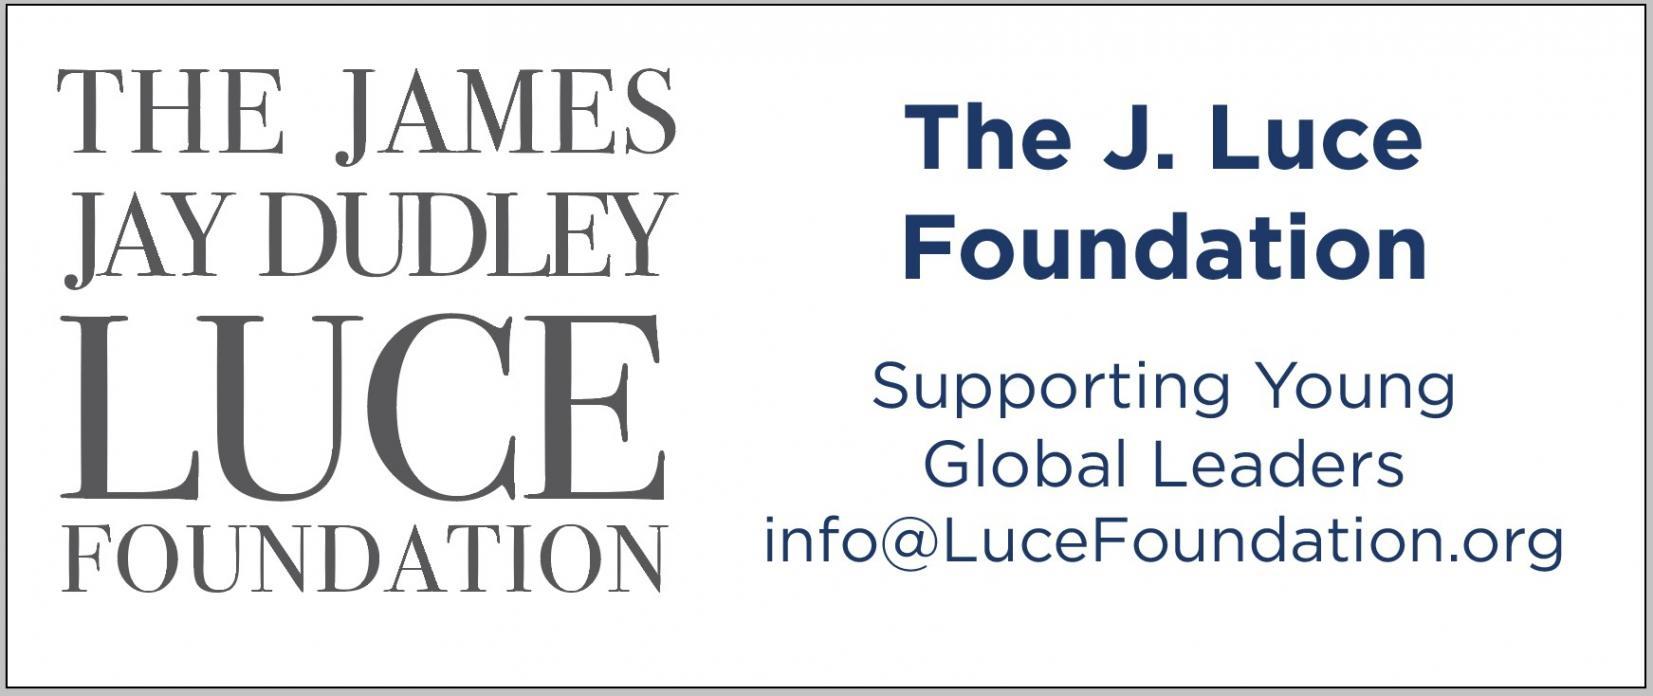 James Jay Dudley Luce Foundation Logo